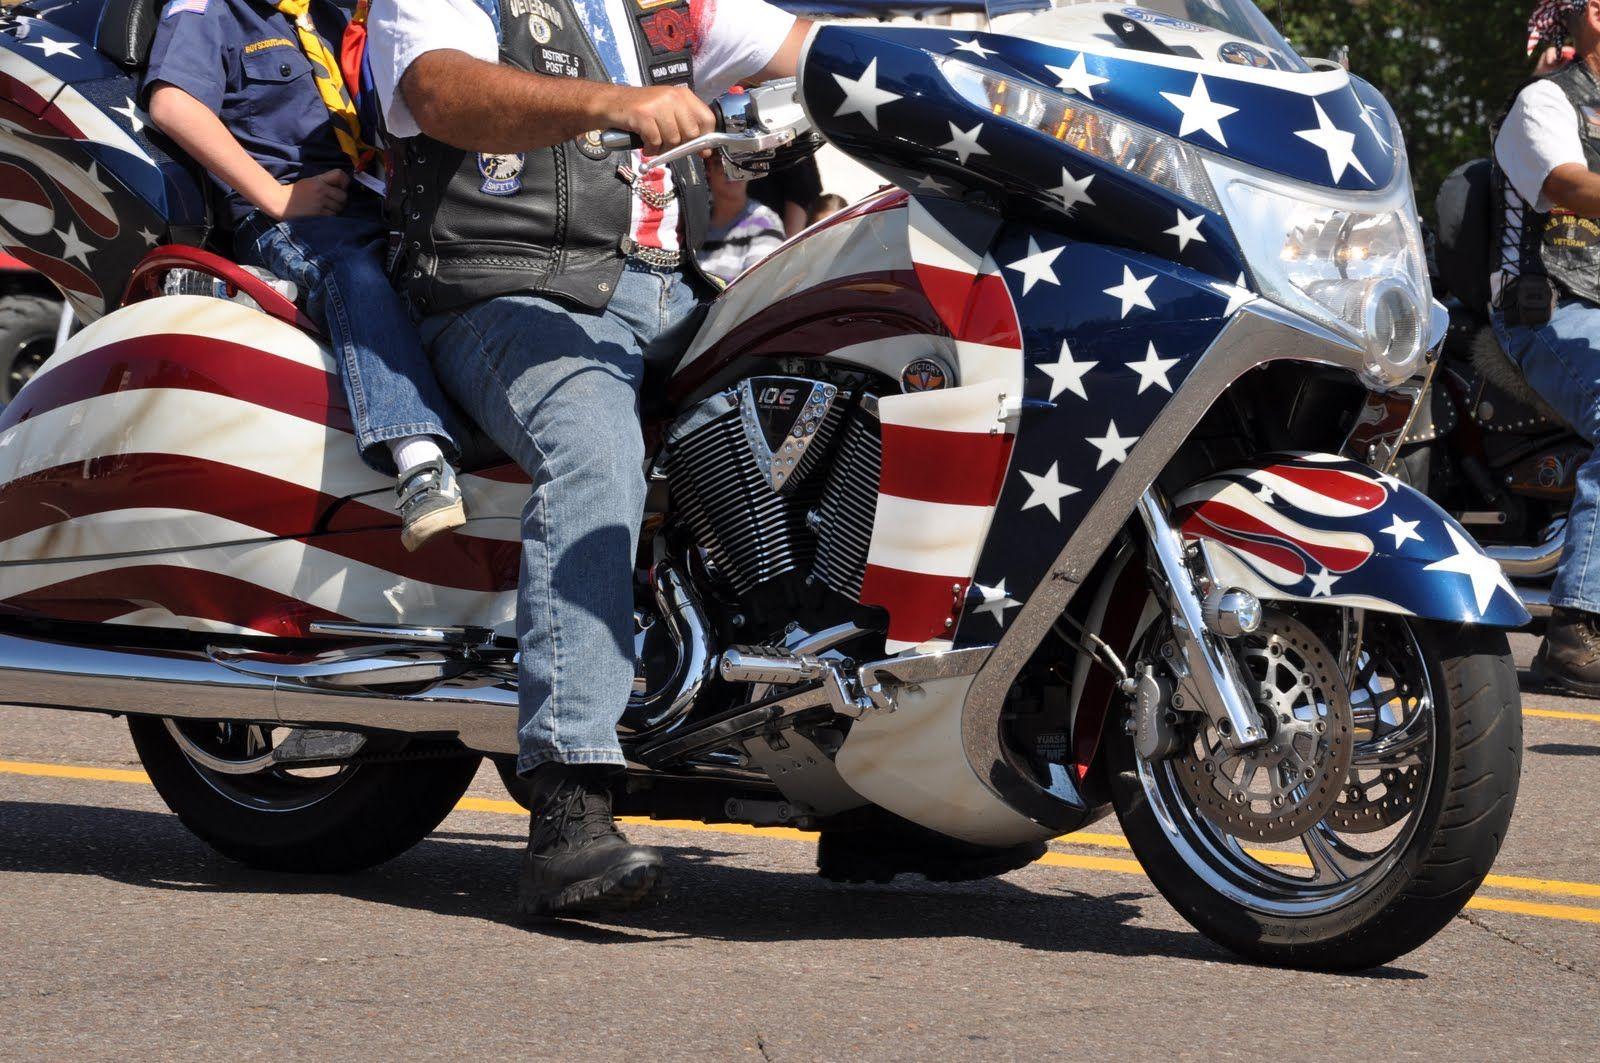 patriotic motorcycle cool pinterest moto. Black Bedroom Furniture Sets. Home Design Ideas